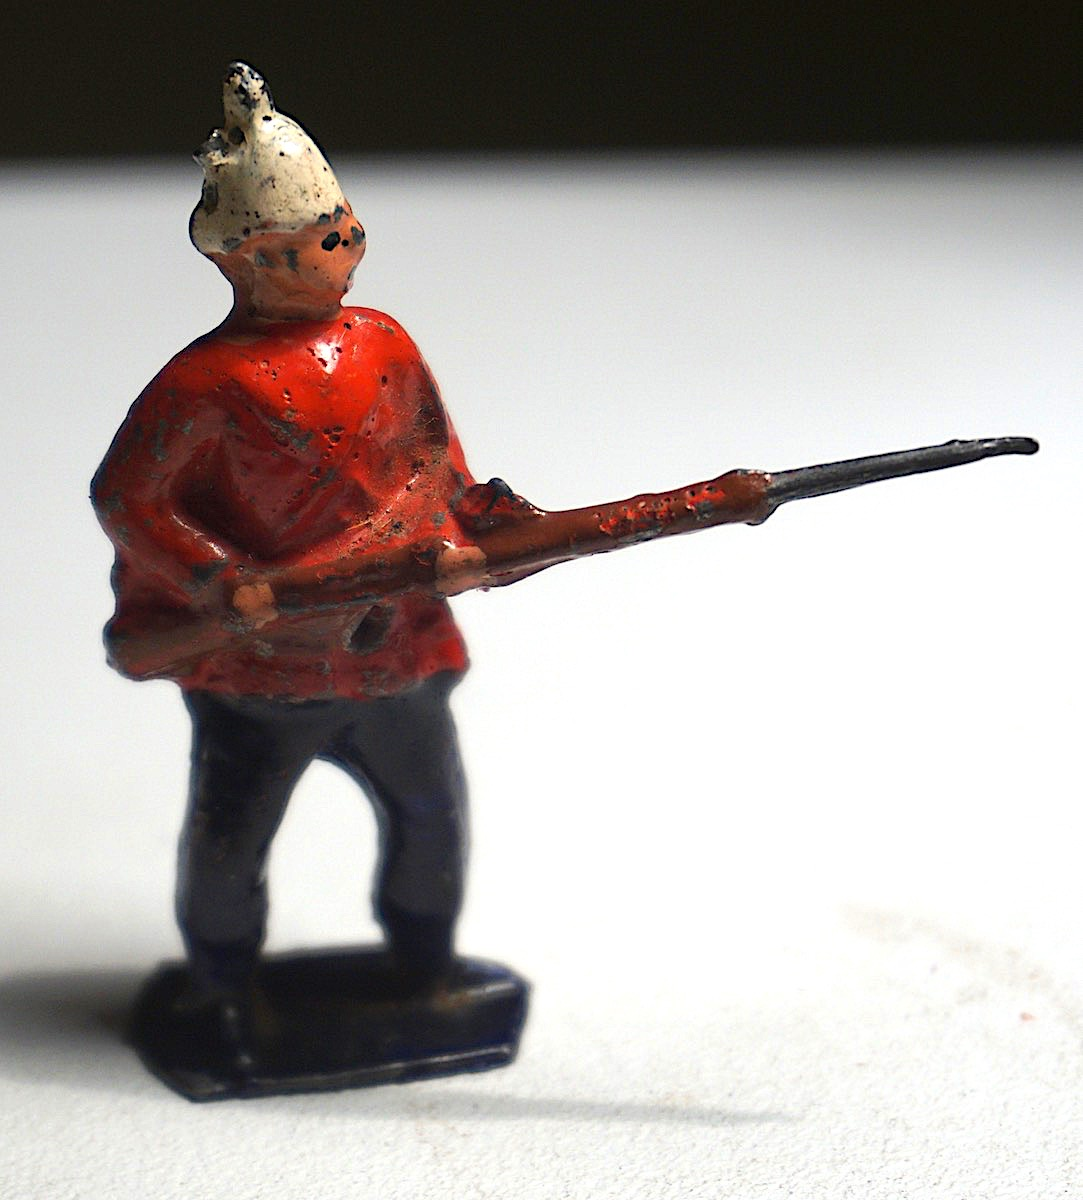 Antique Metal Toy Soldier 1890 1914 Antiche Curiosit 224